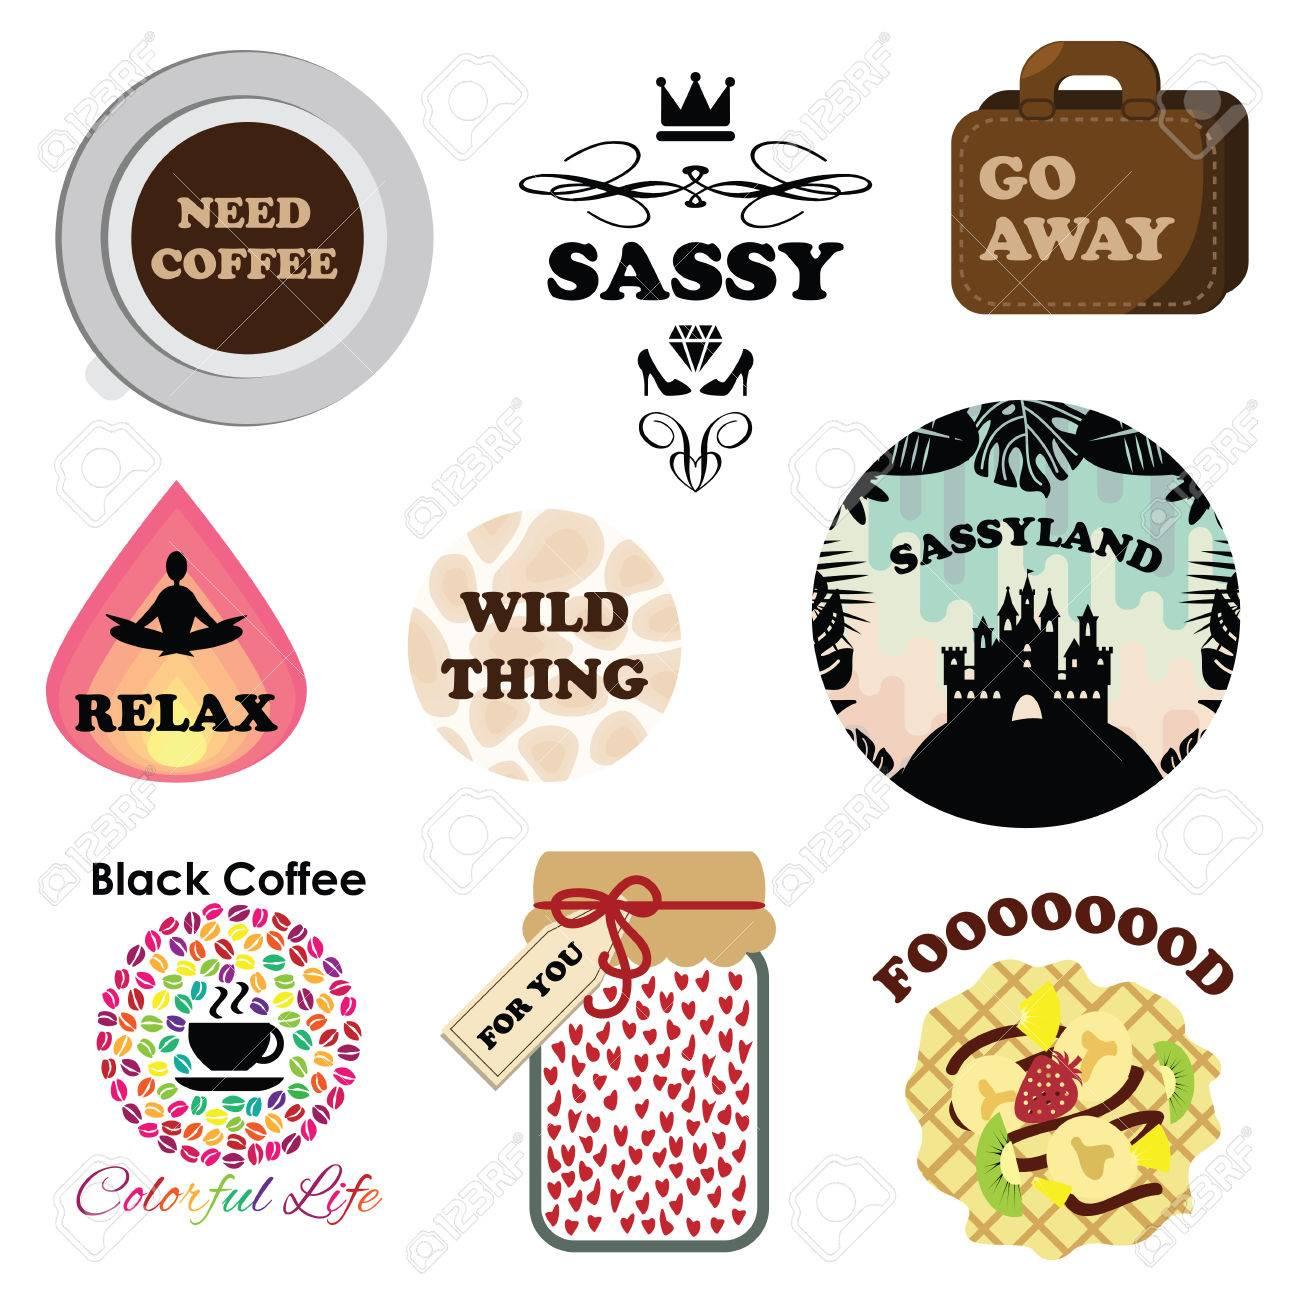 vector illustration for modern funny stickers for messenger or